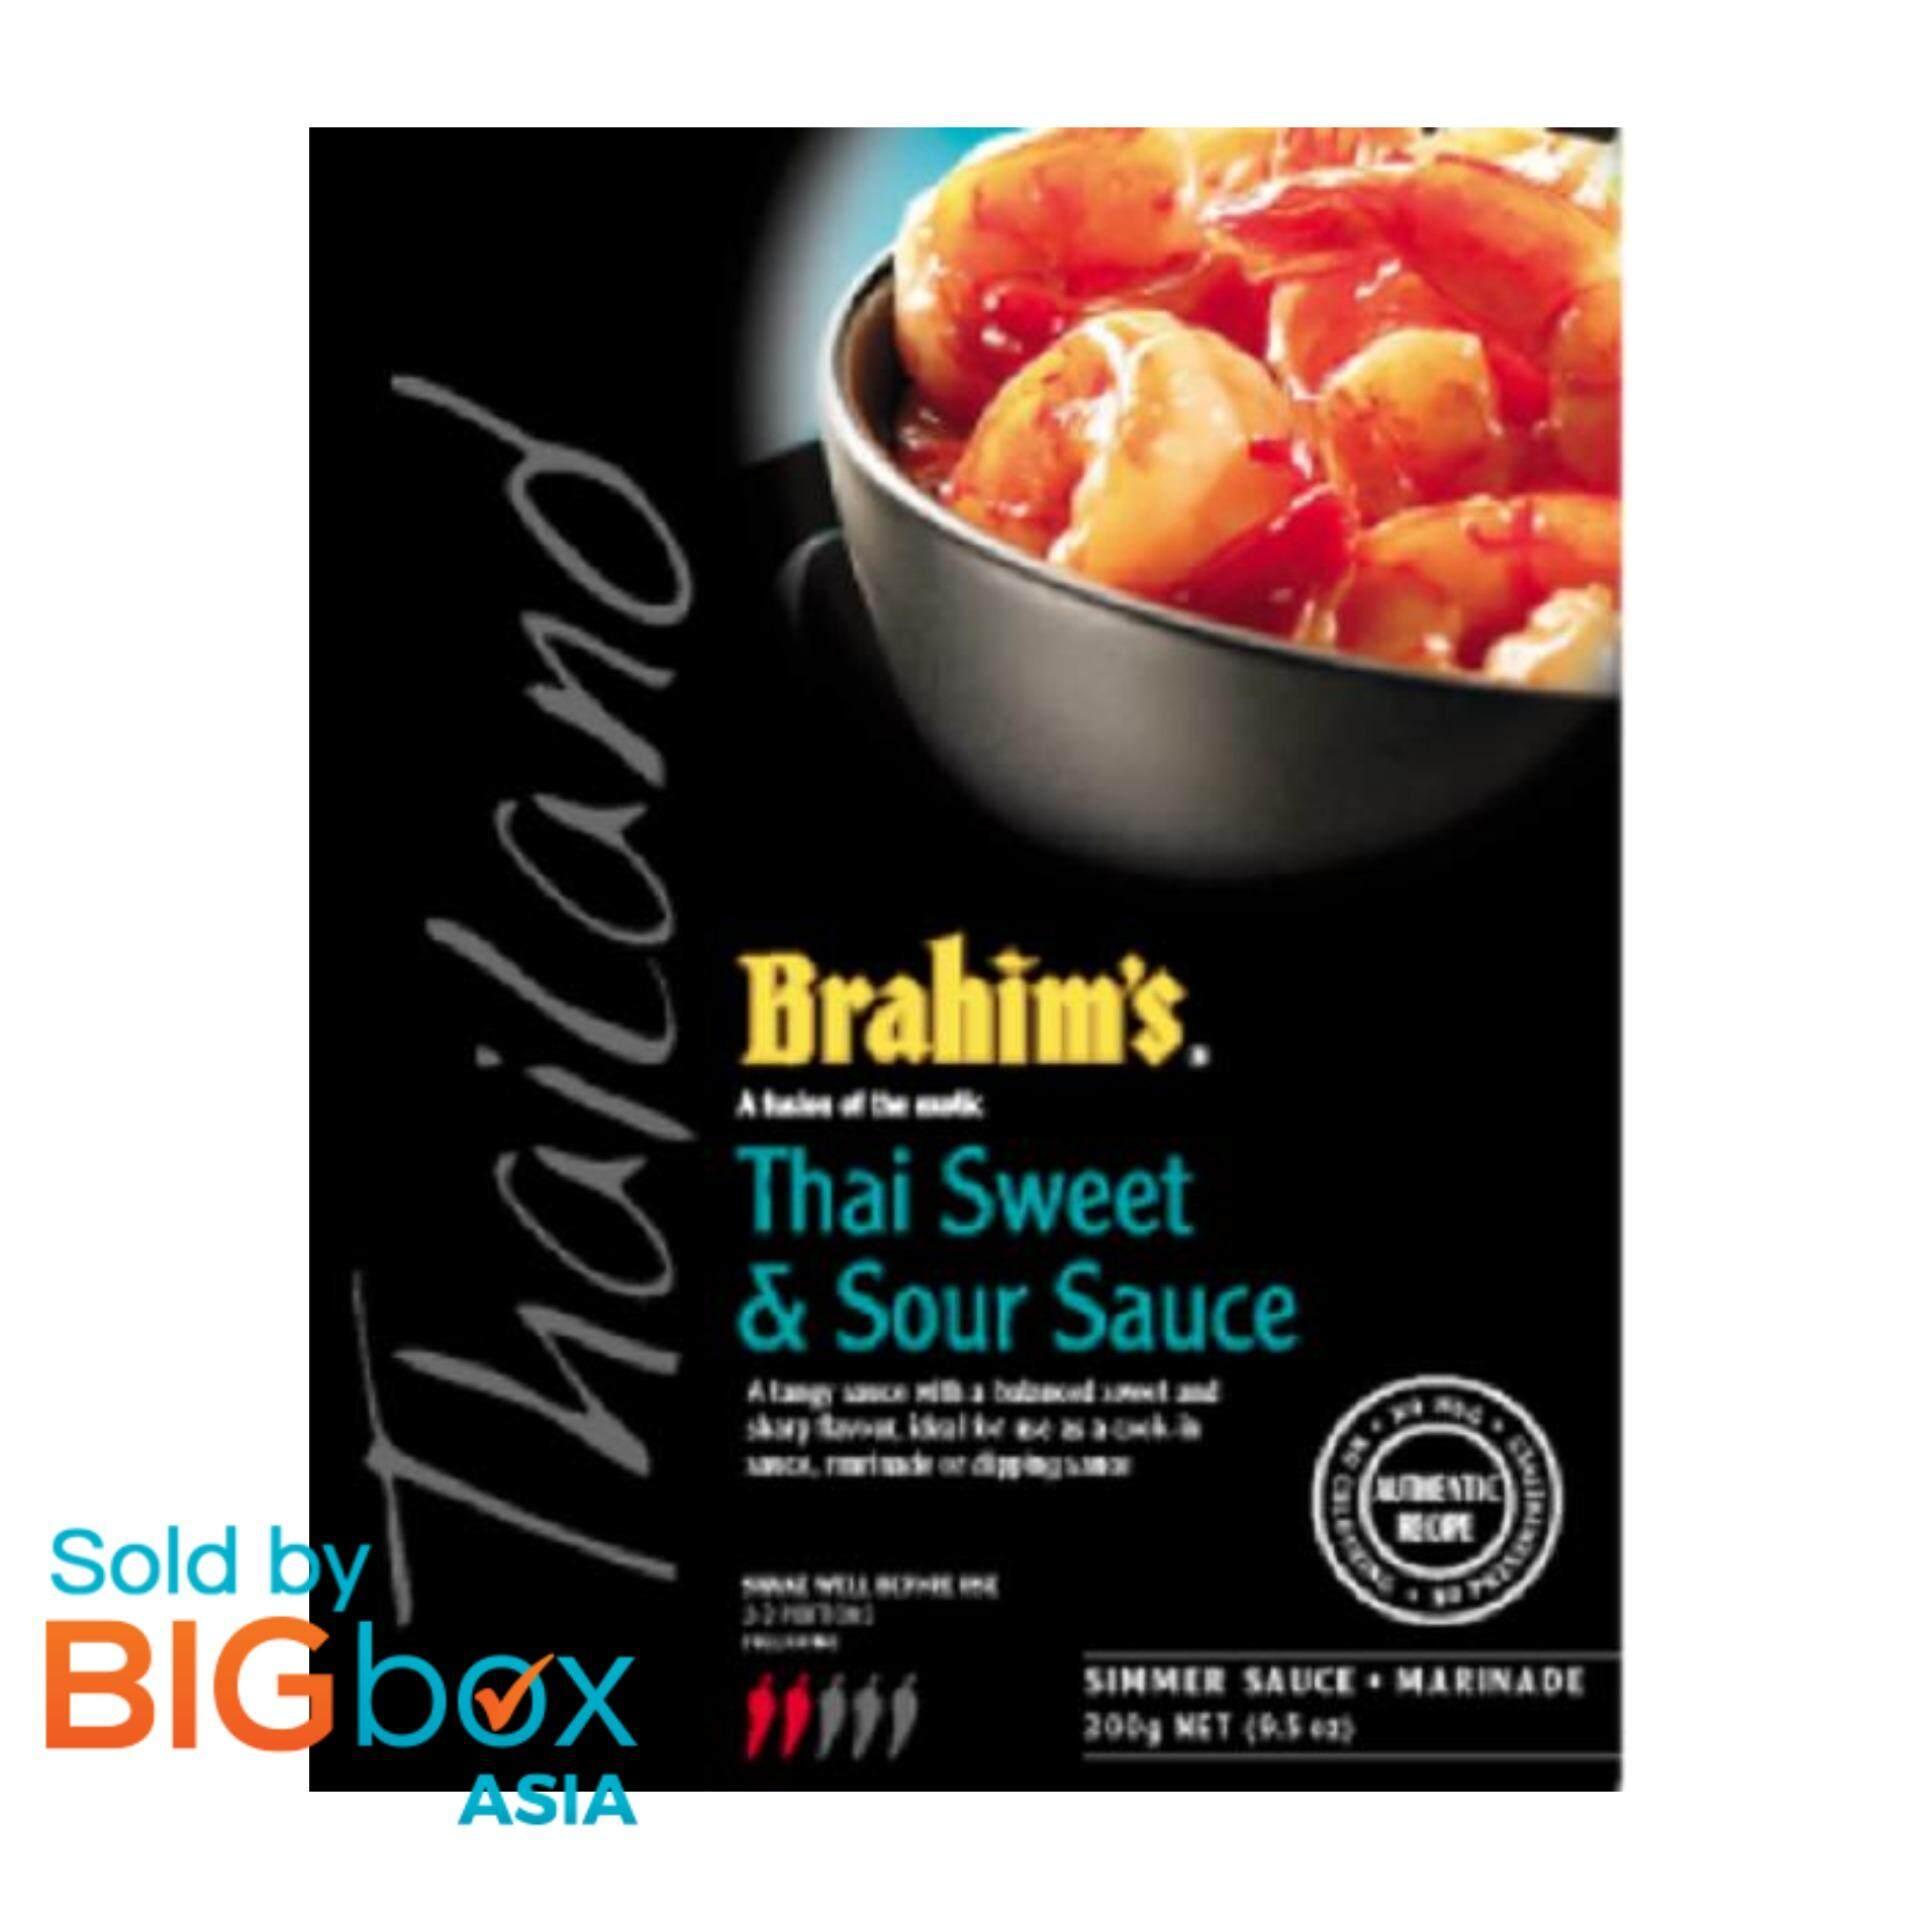 [BIGBox Asia] Brahim's Sweet and Sour Simmer Sauce/ Kuah Masam Manis Thai 300g - Malaysia